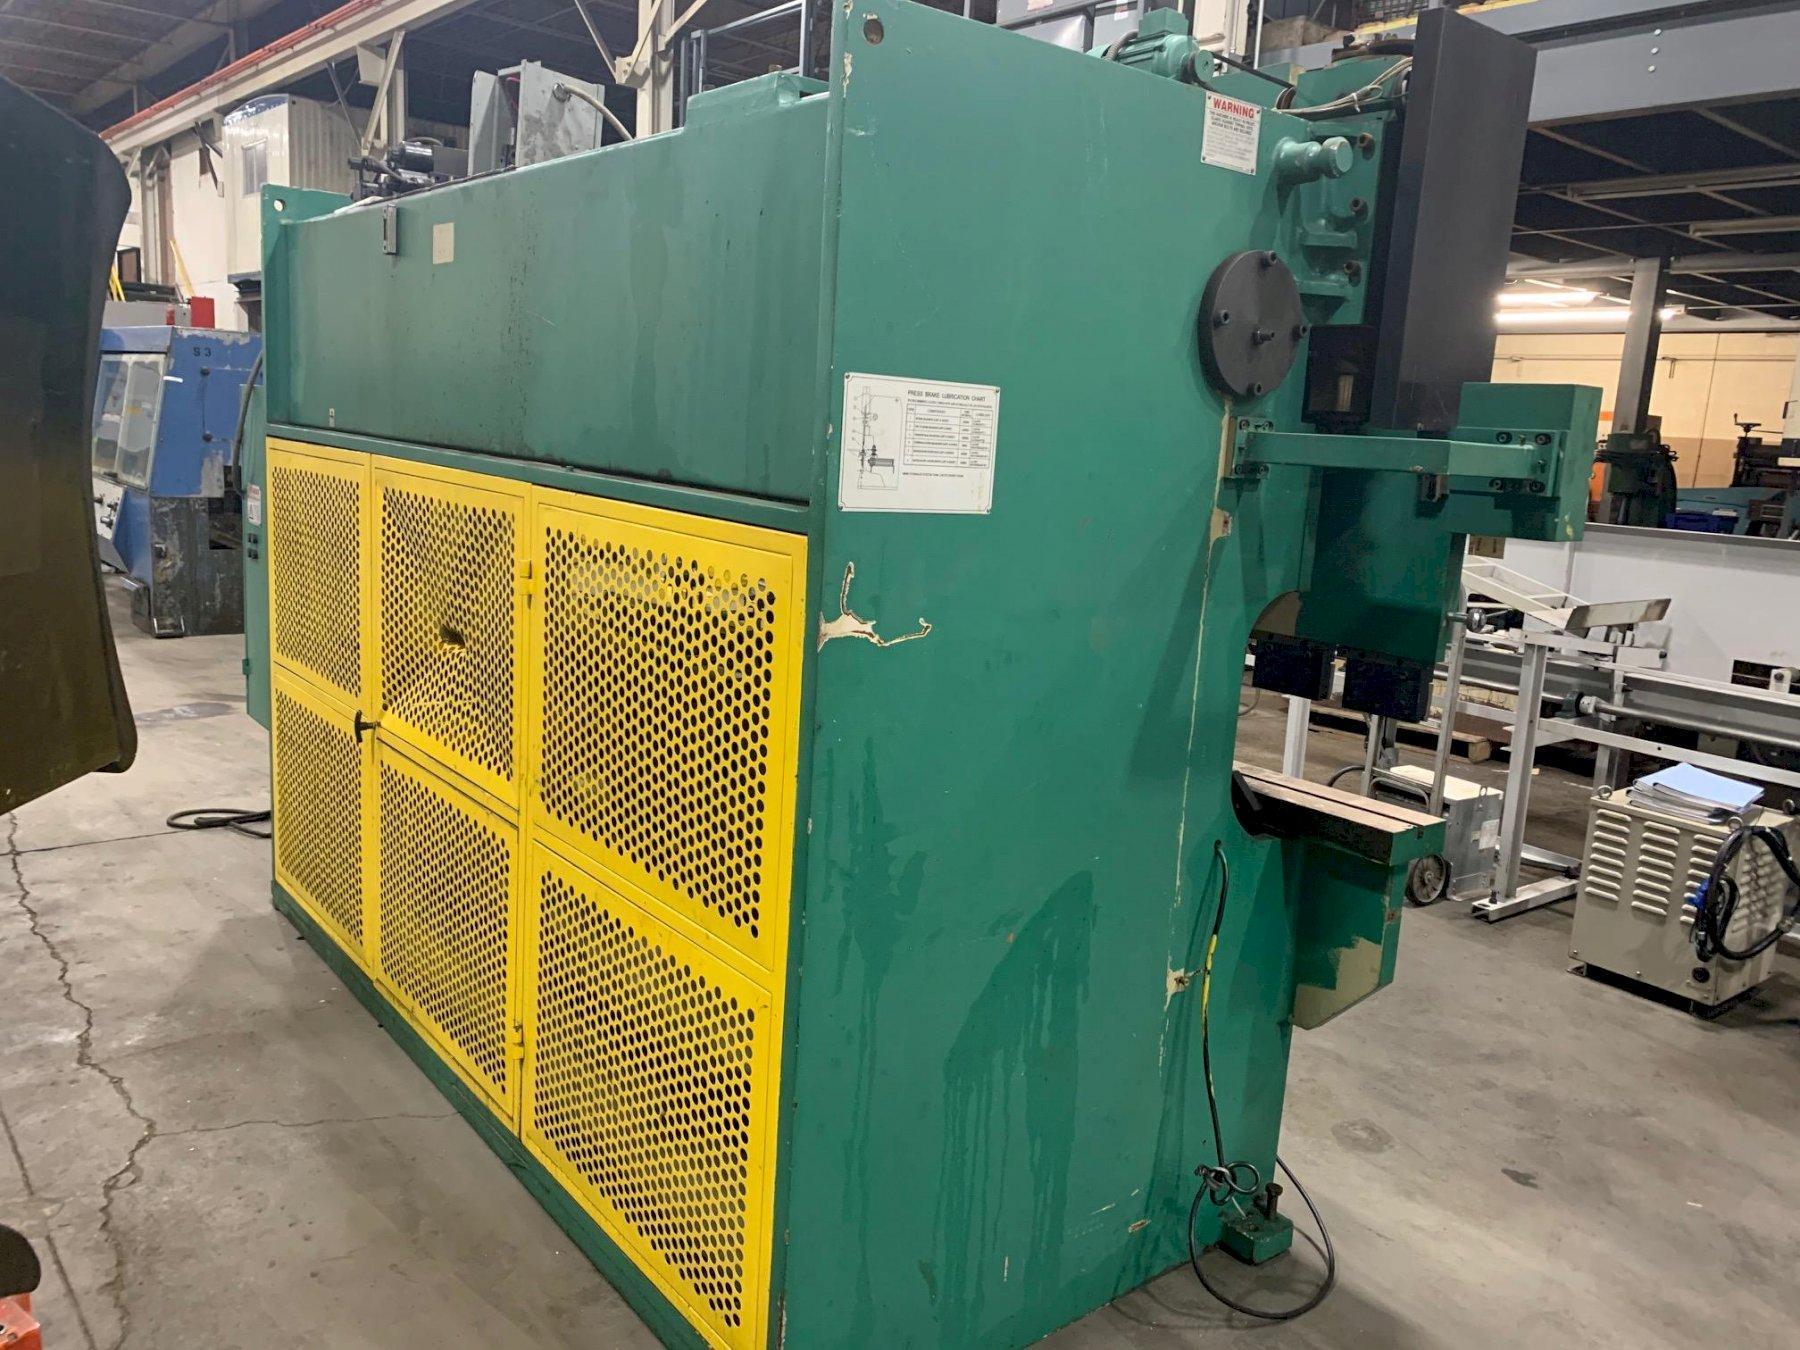 USED U.S. INDUSTRIAL 88 TON X 10' HYDRAULIC 2-AXIS CNC PRESS BRAKE, Year 2004, Stock #10703